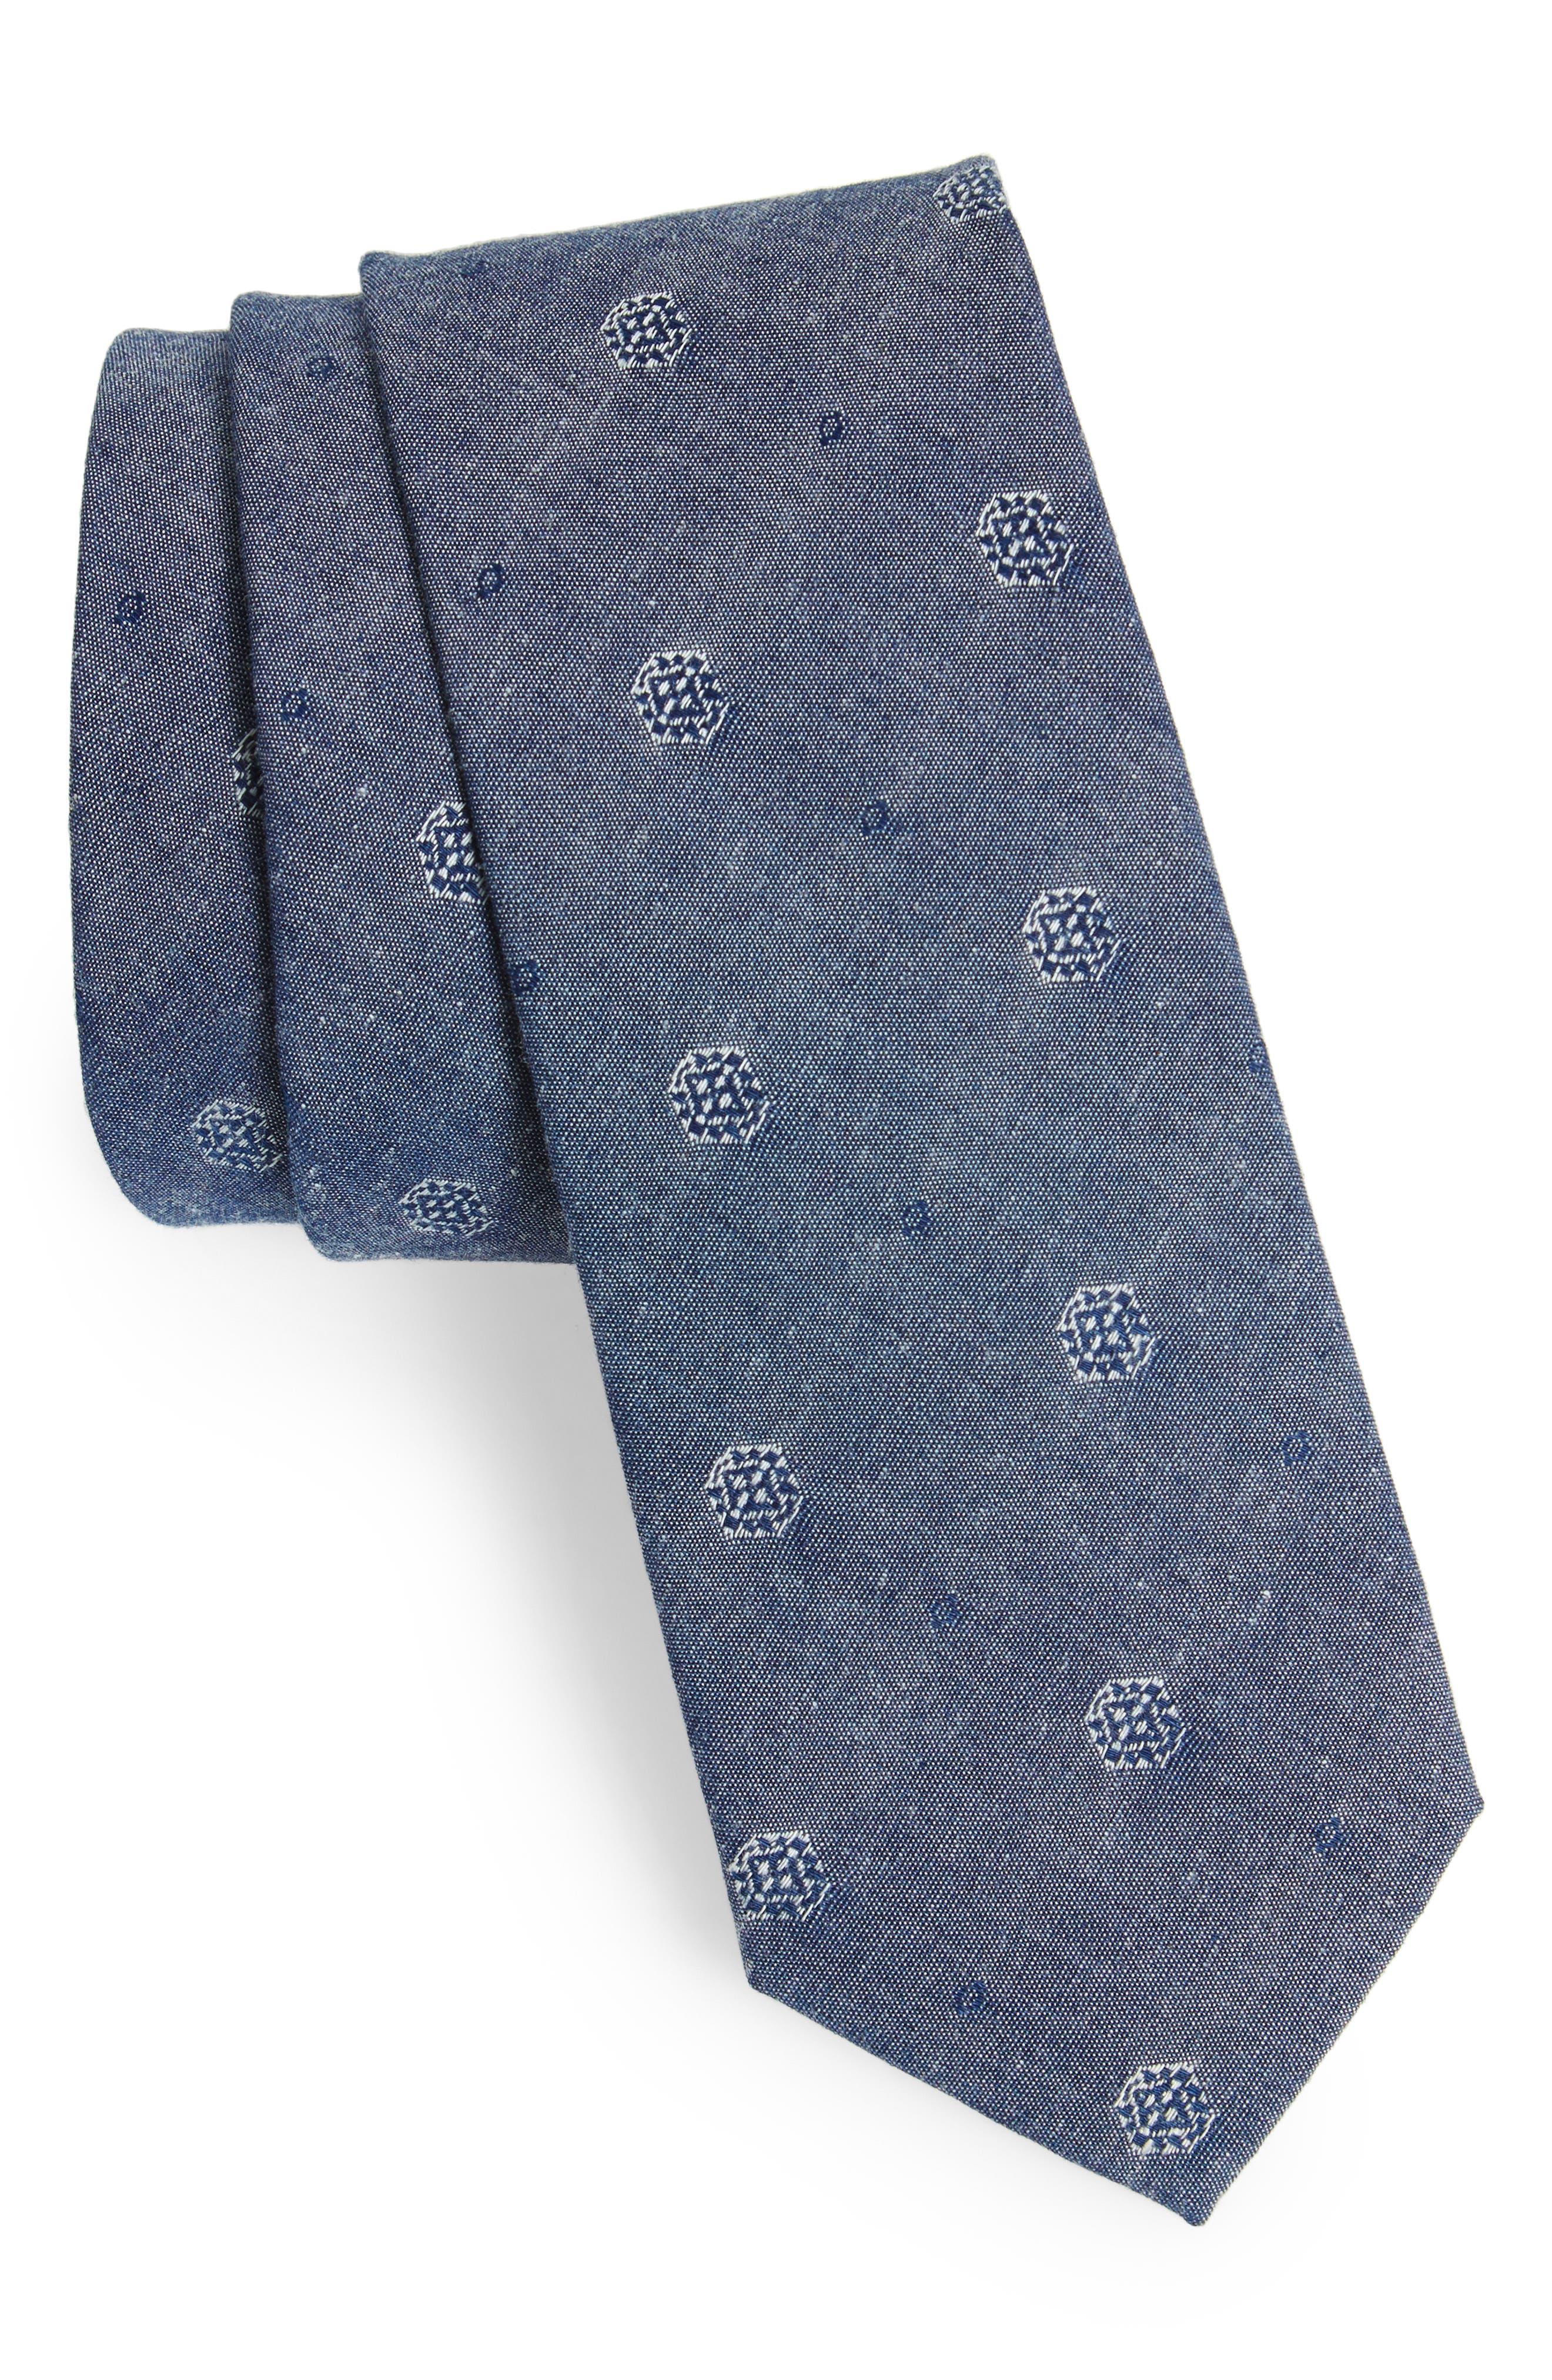 Medallion Cotton Tie,                         Main,                         color, Navy